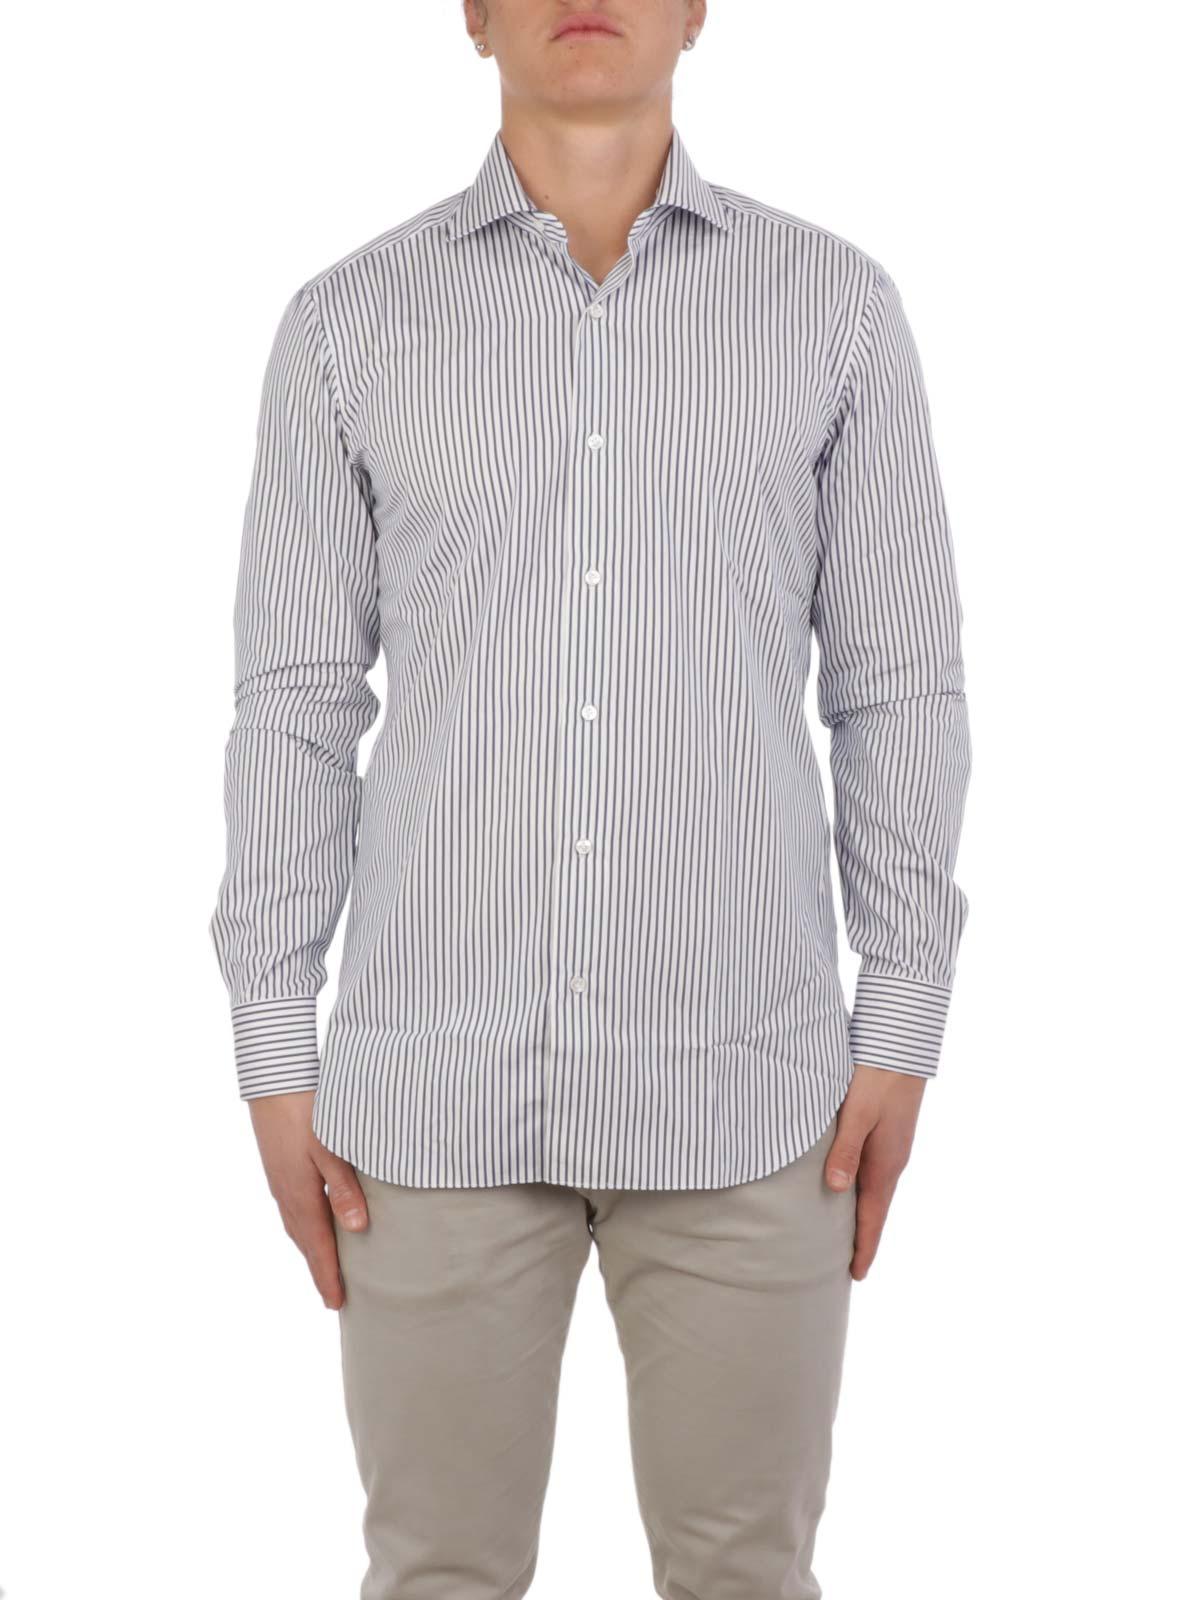 Picture of BARBA | Men's Cotton Striped Shirt